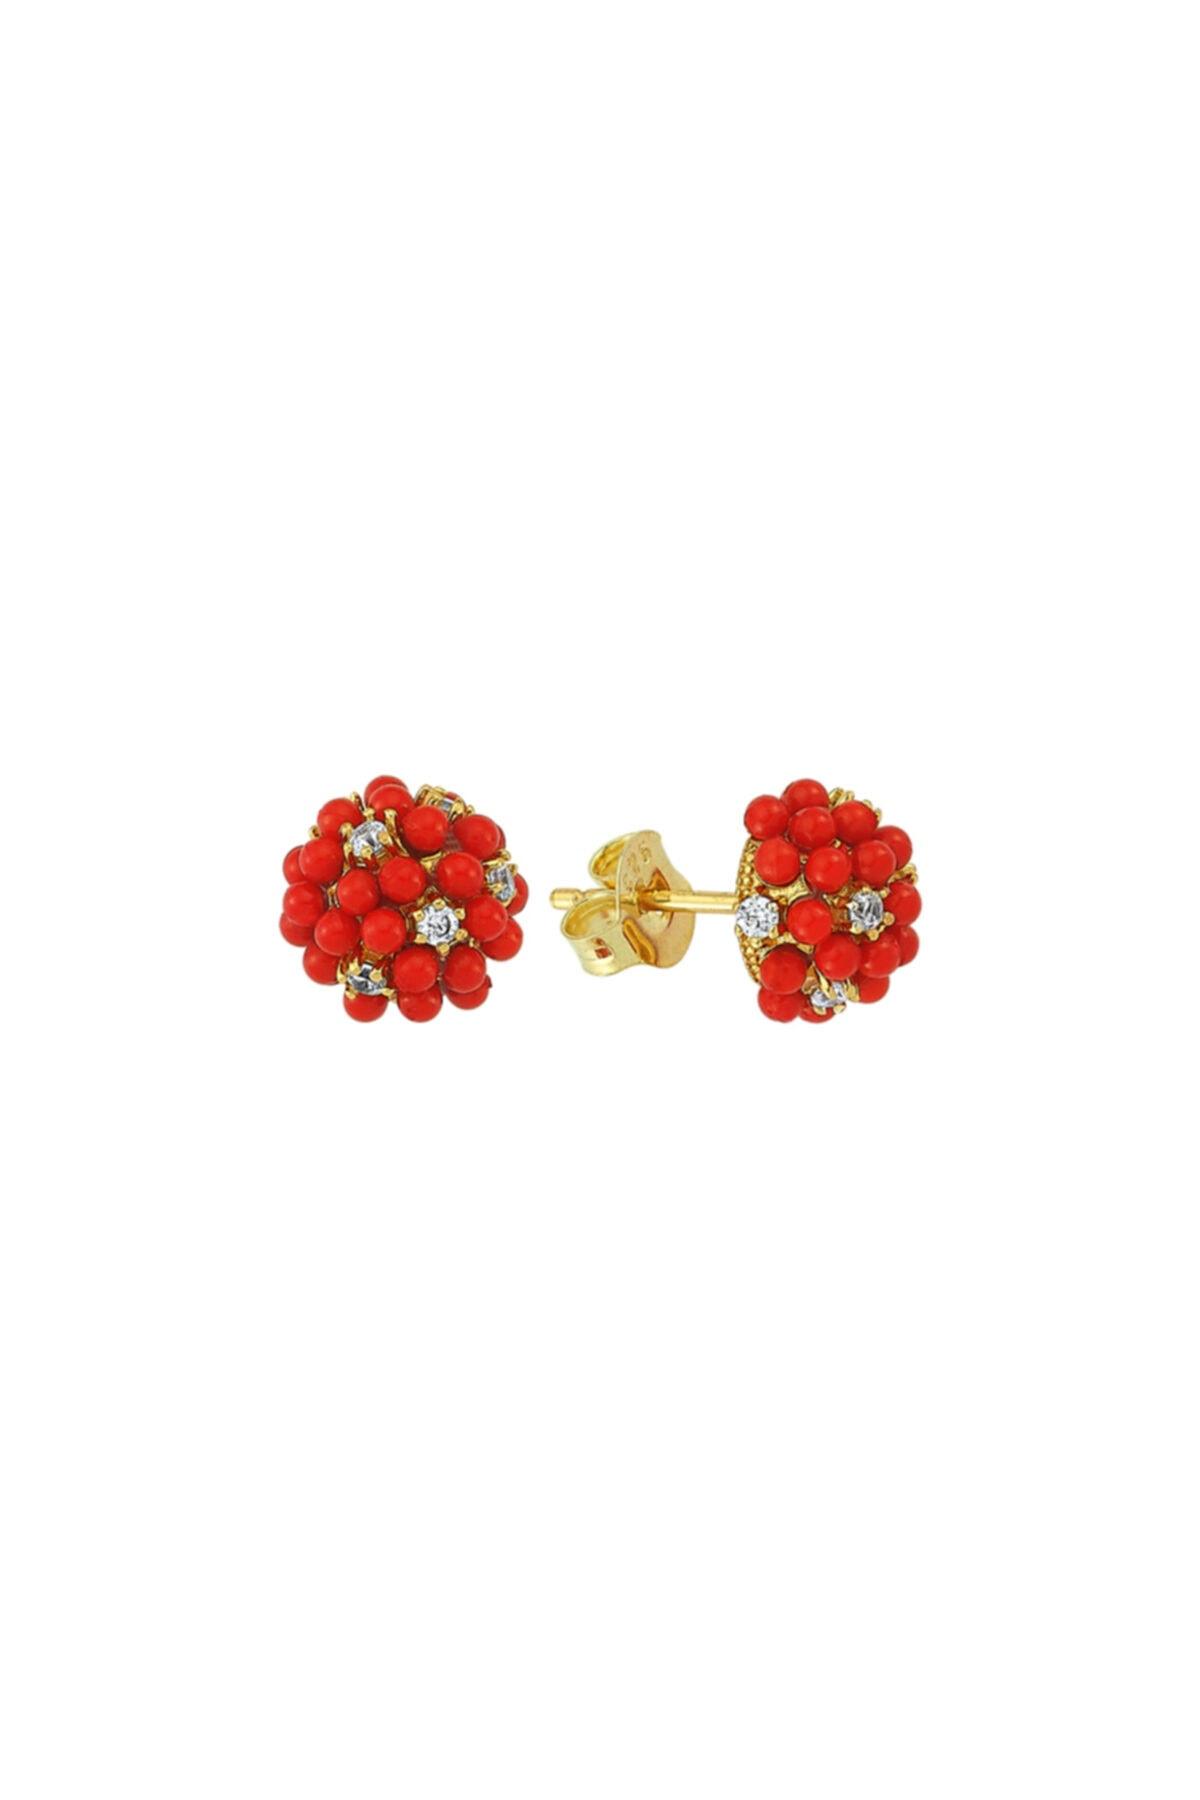 Luzdemia Red Grape Earr. 925 1